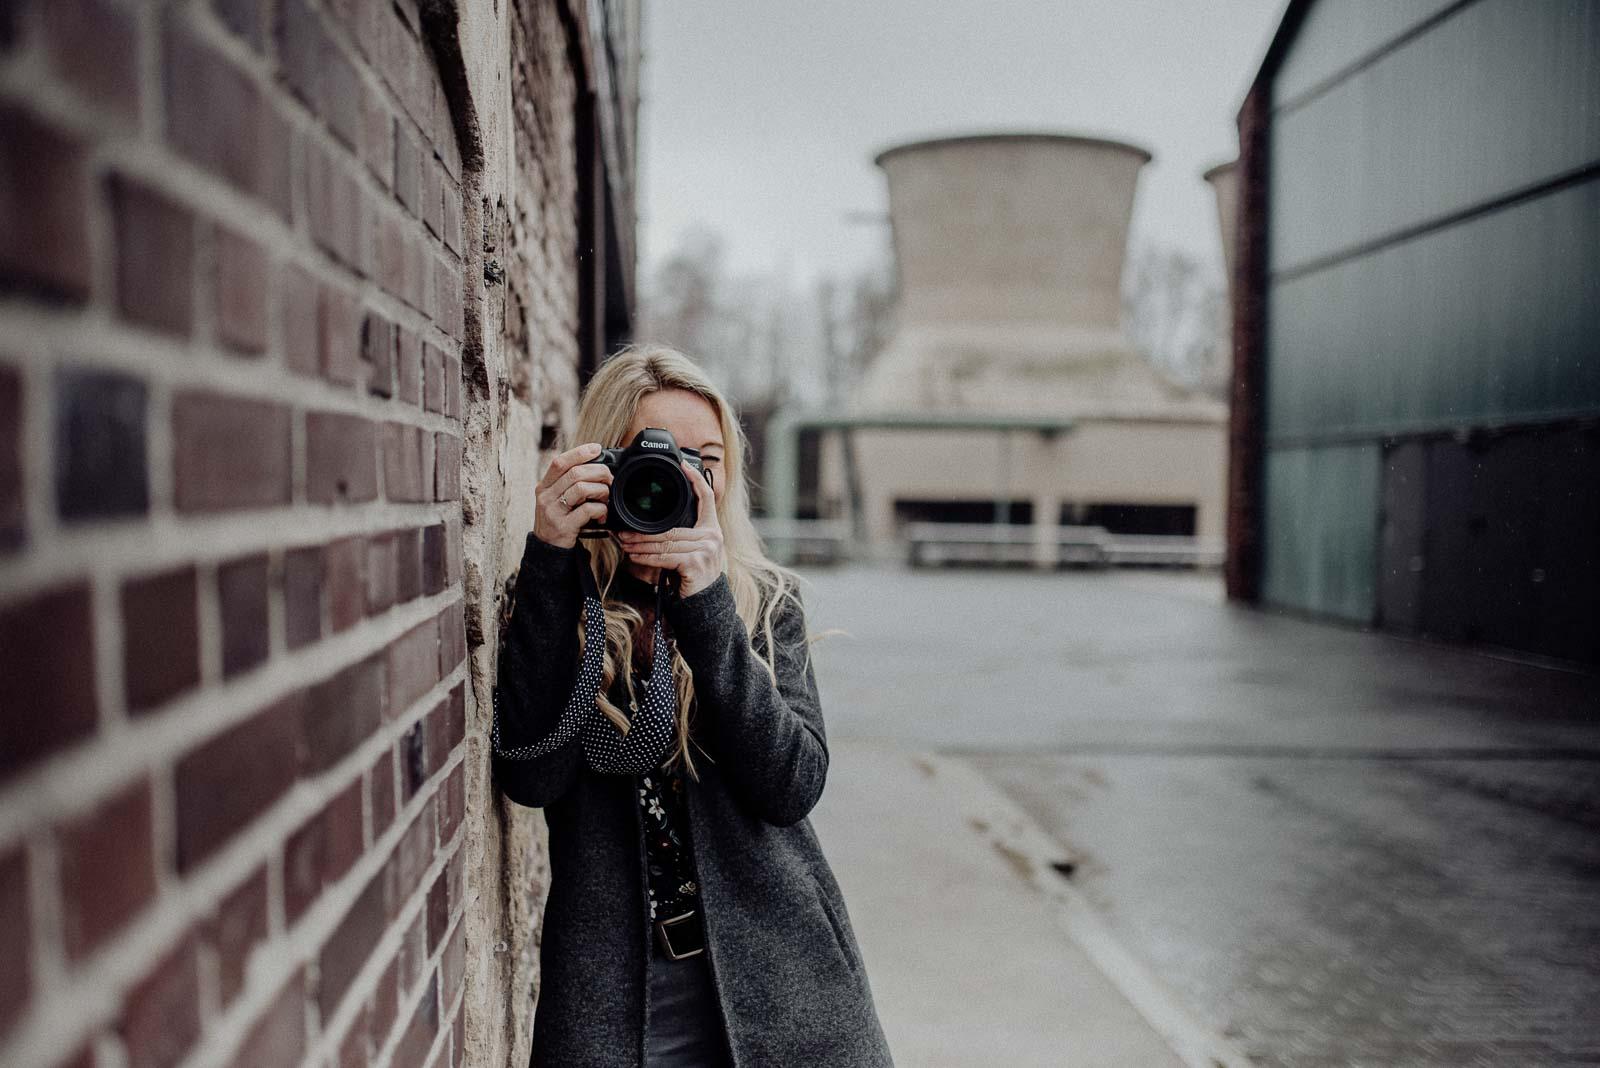 040-fotograf-witten-bochum-businessshooting-urban